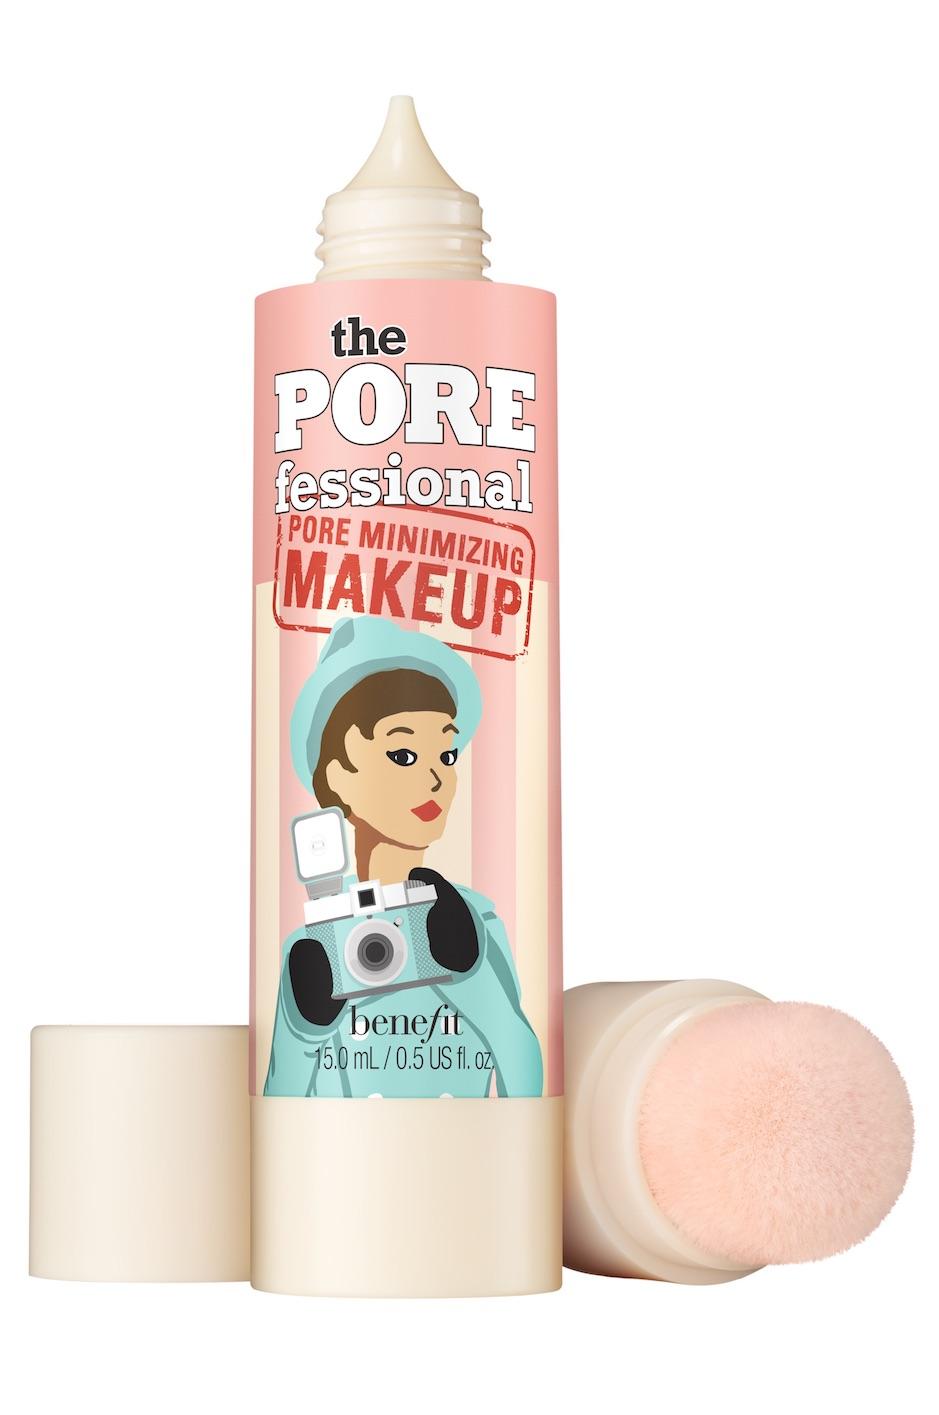 Pore-Minimizing-Makeup1.jpg